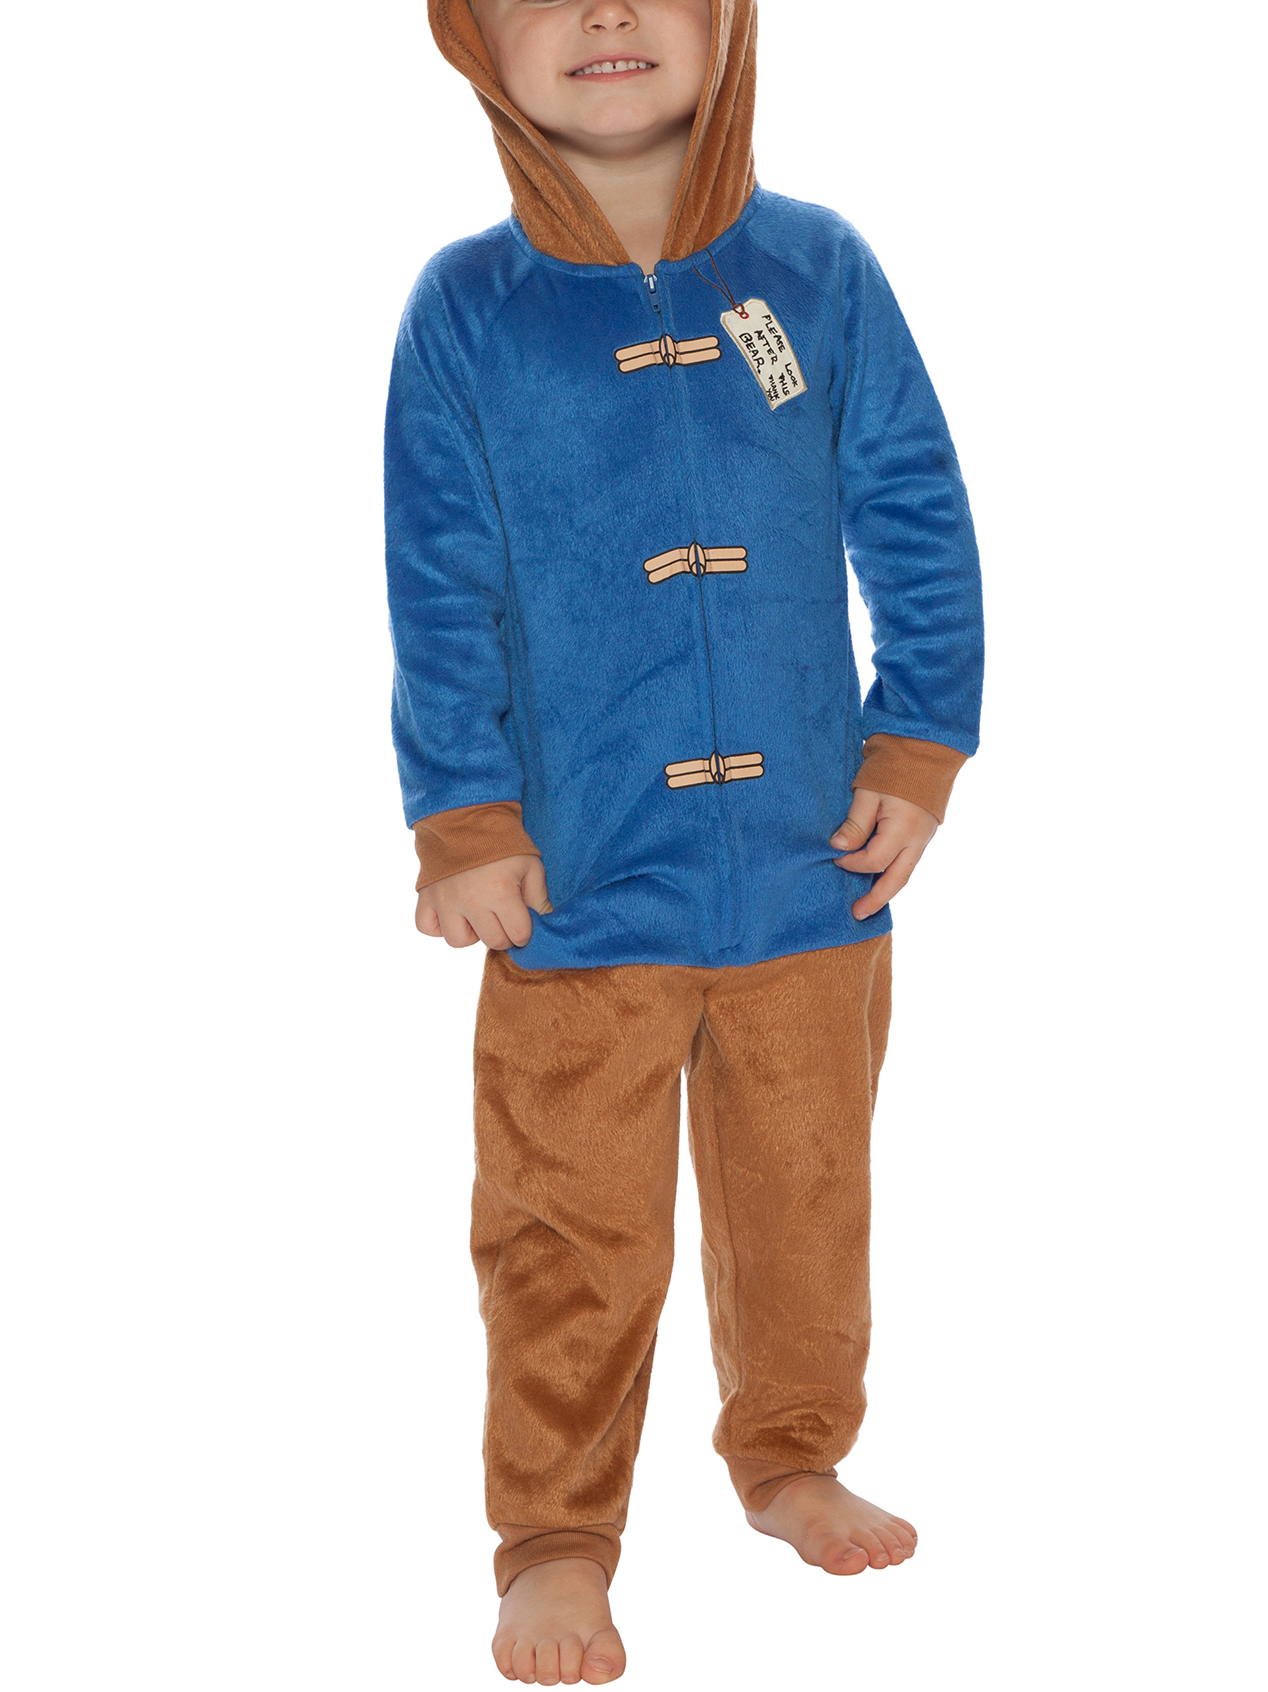 Long Sleeve Costume One-piece Unionsuit Pajama (Toddler Boys or Toddler Girls Unisex)